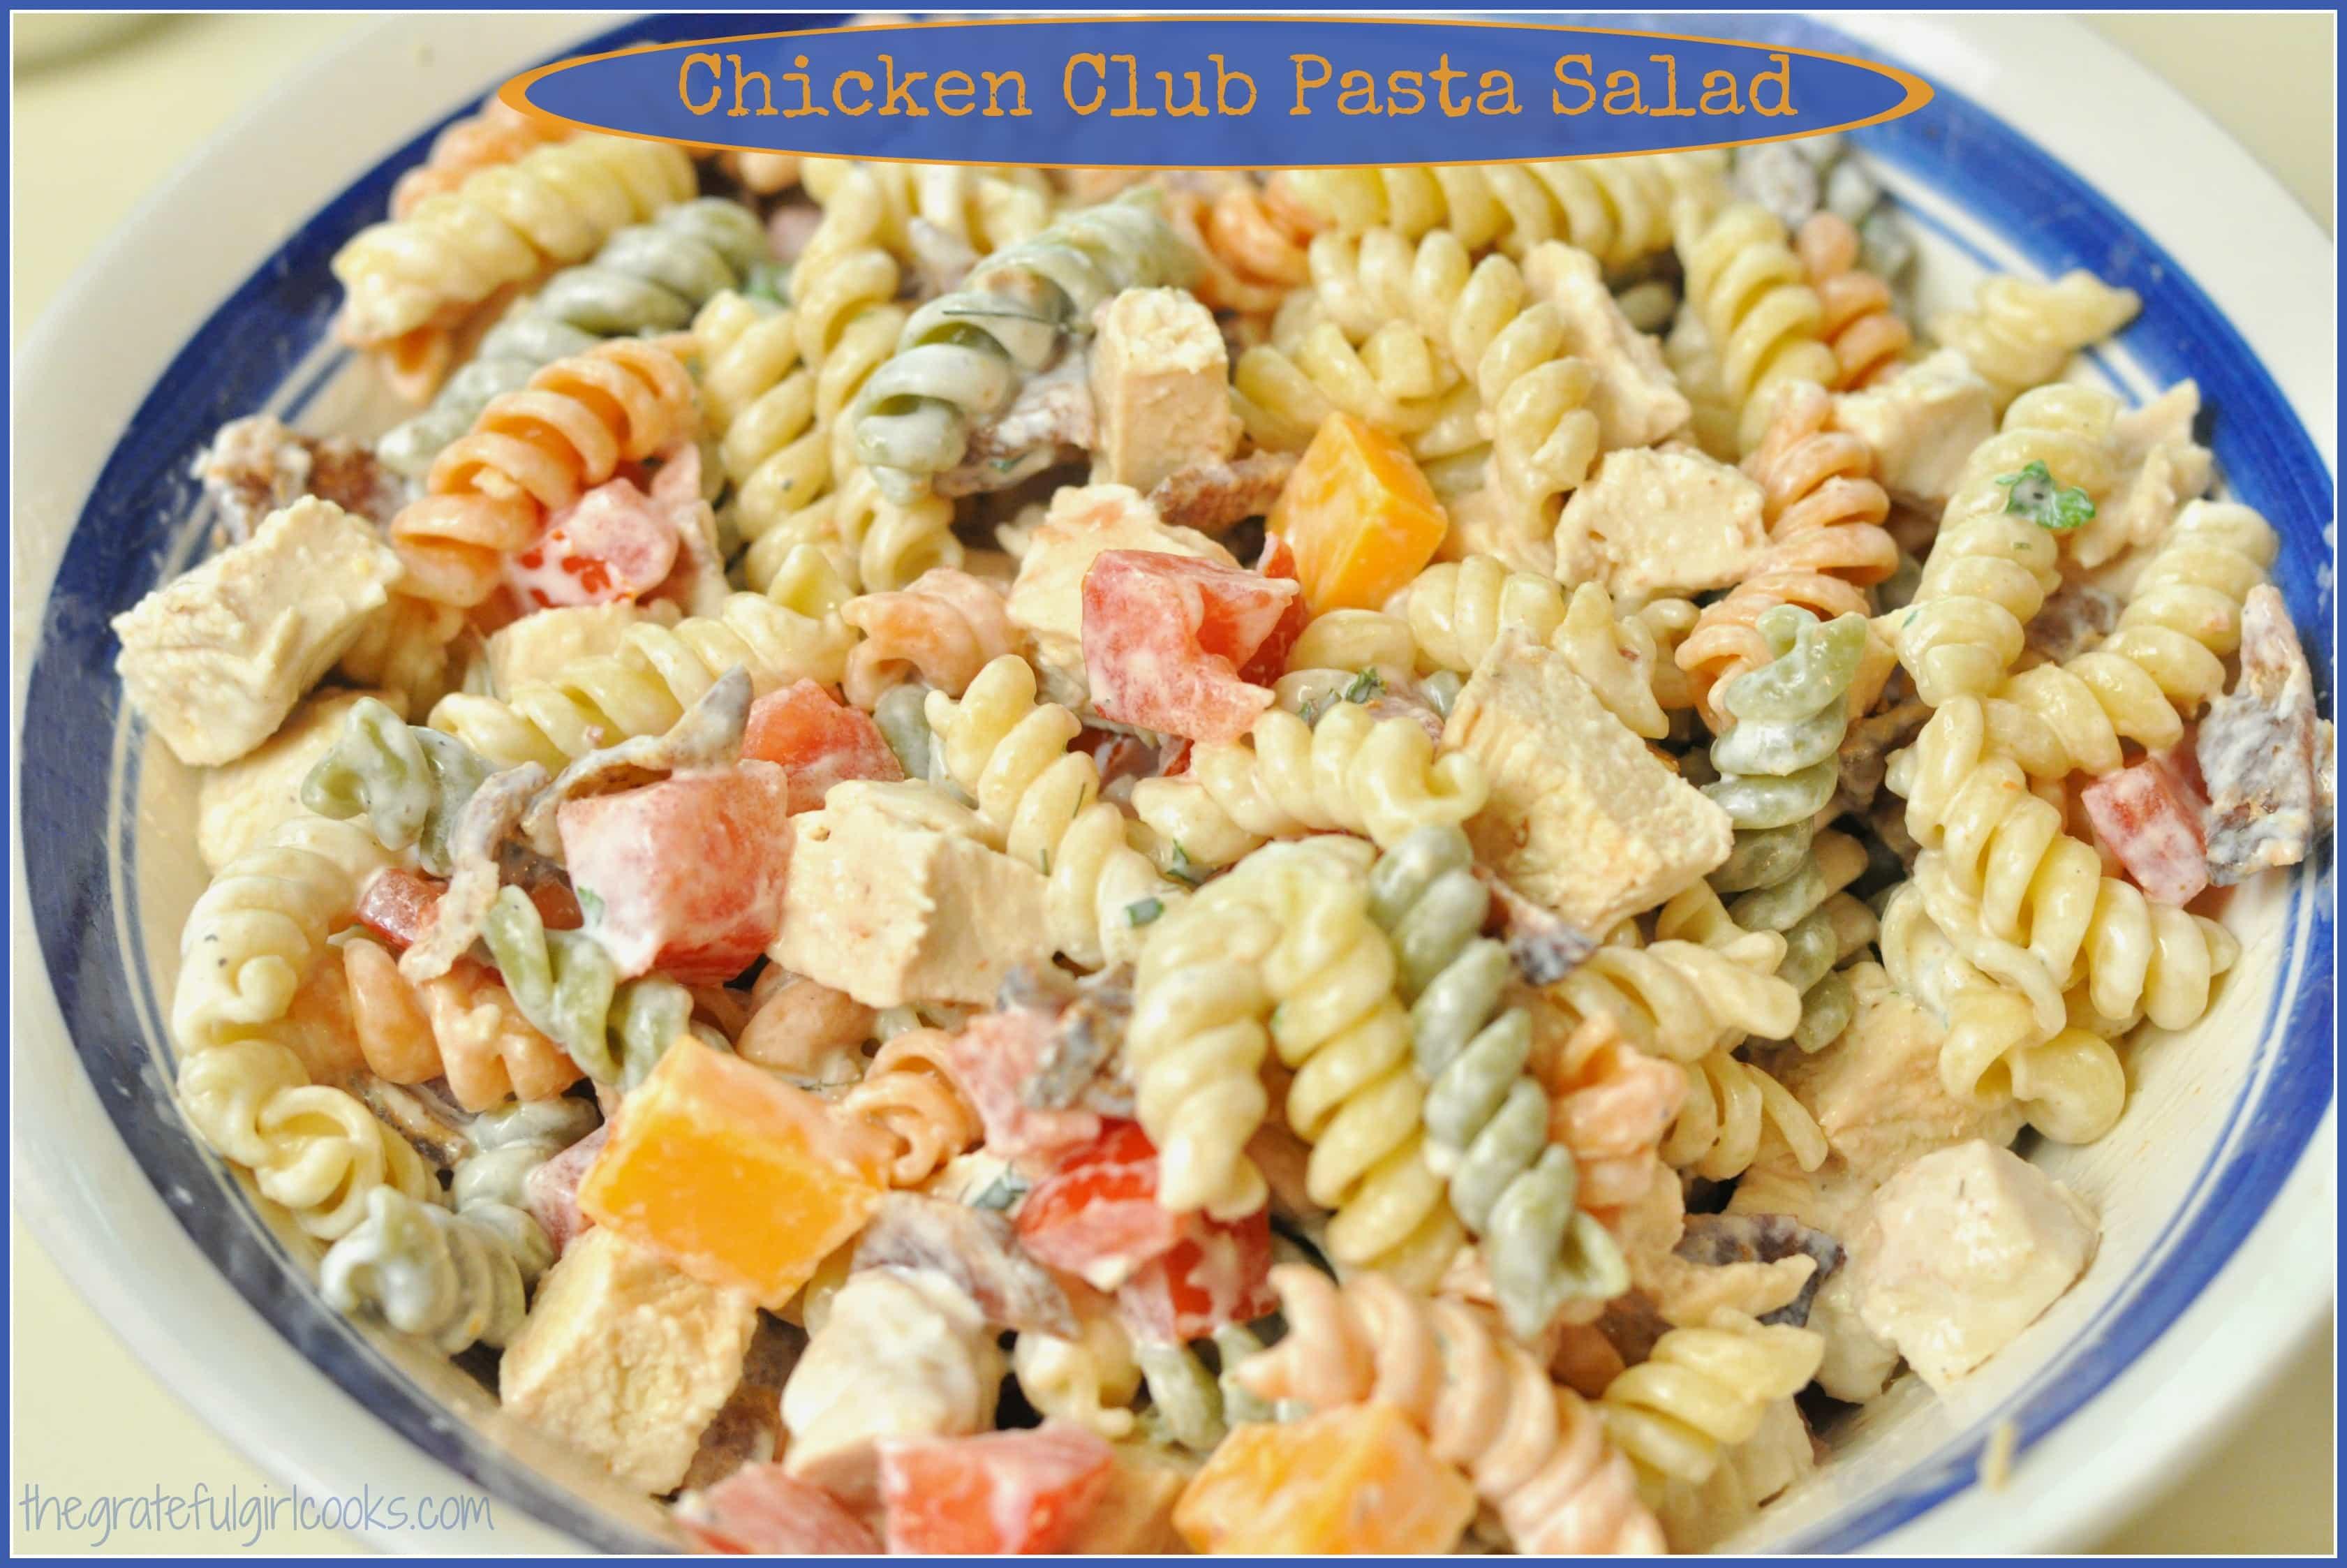 Chicken Club Pasta Salad | The Grateful Girl Cooks!